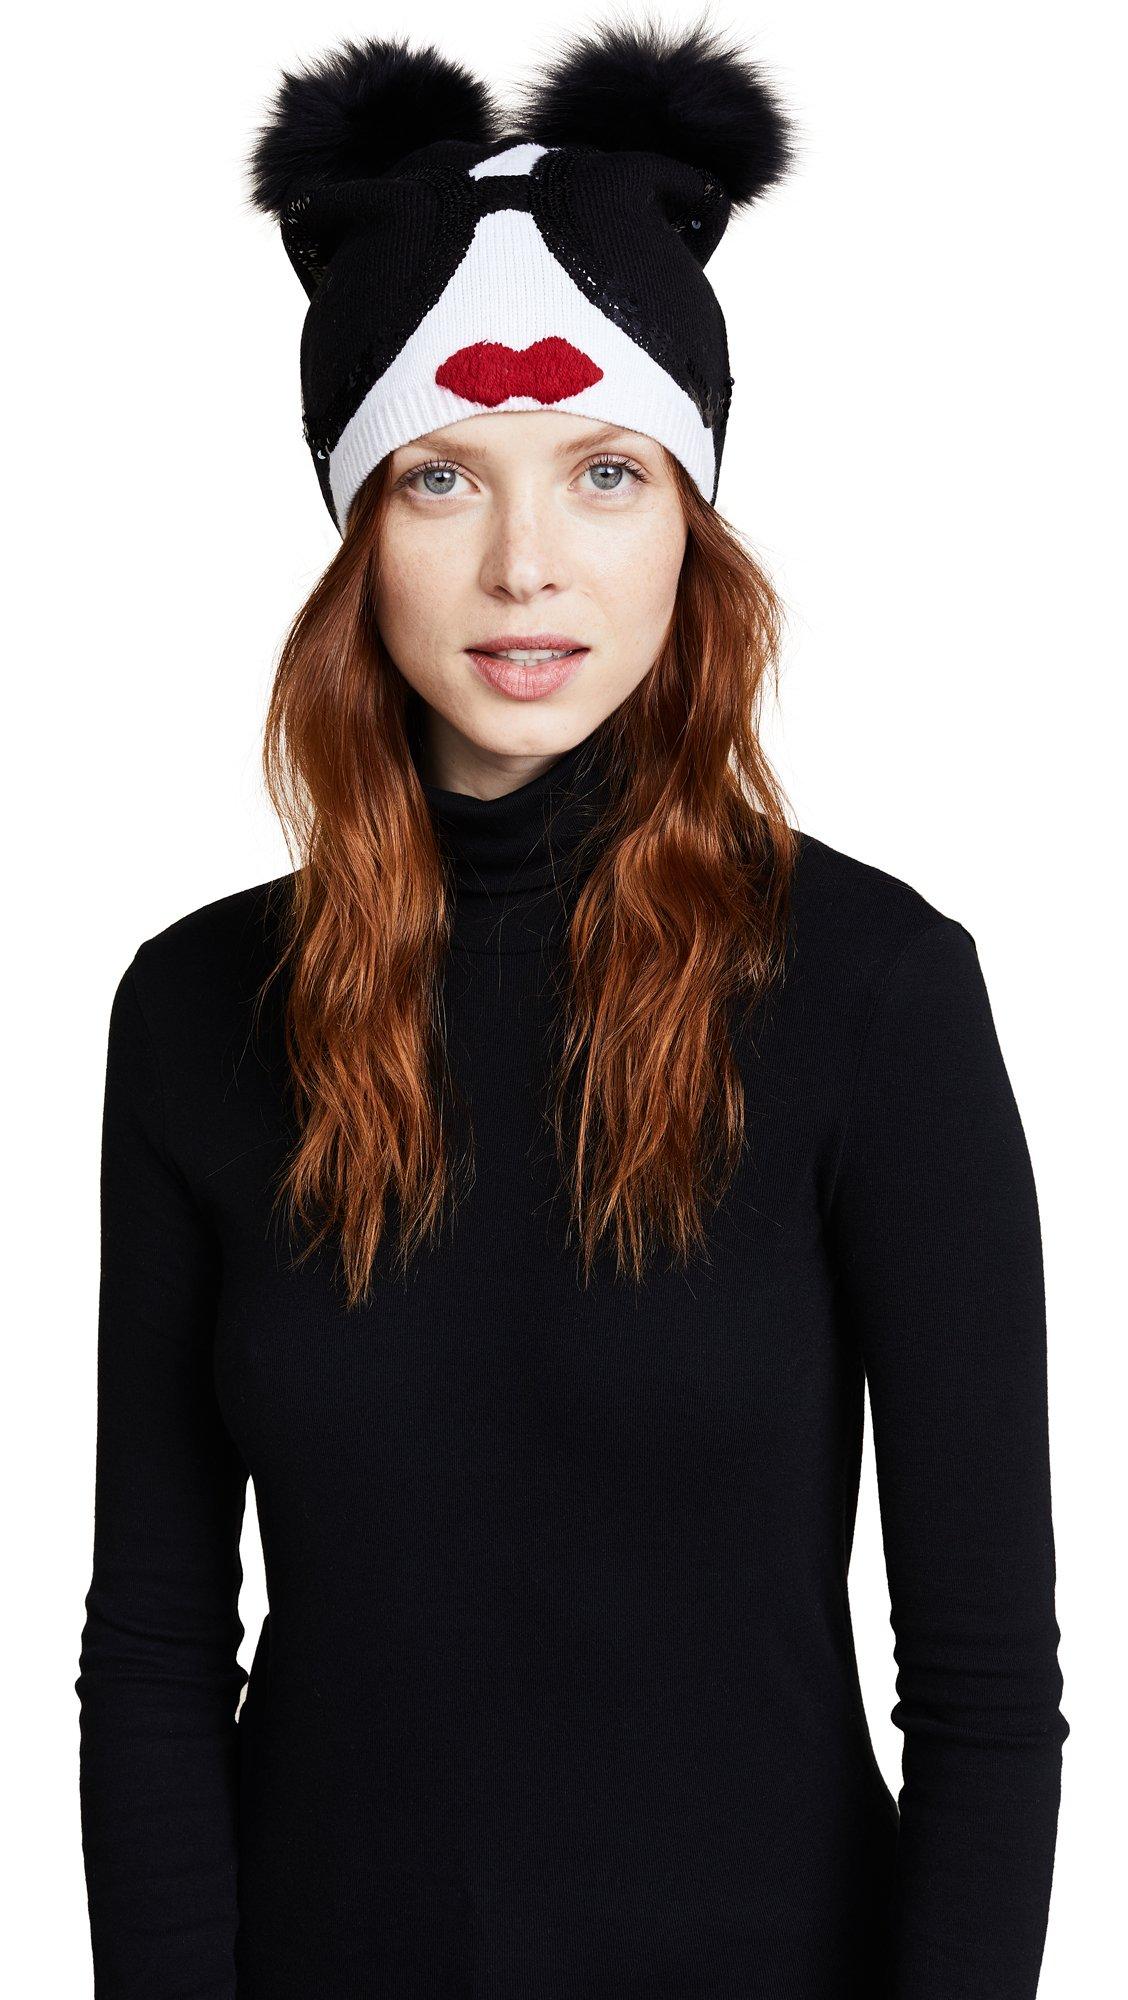 alice + olivia Women's Rinn Chunky Beanie with Fur Pom Poms, Black/White, One Size